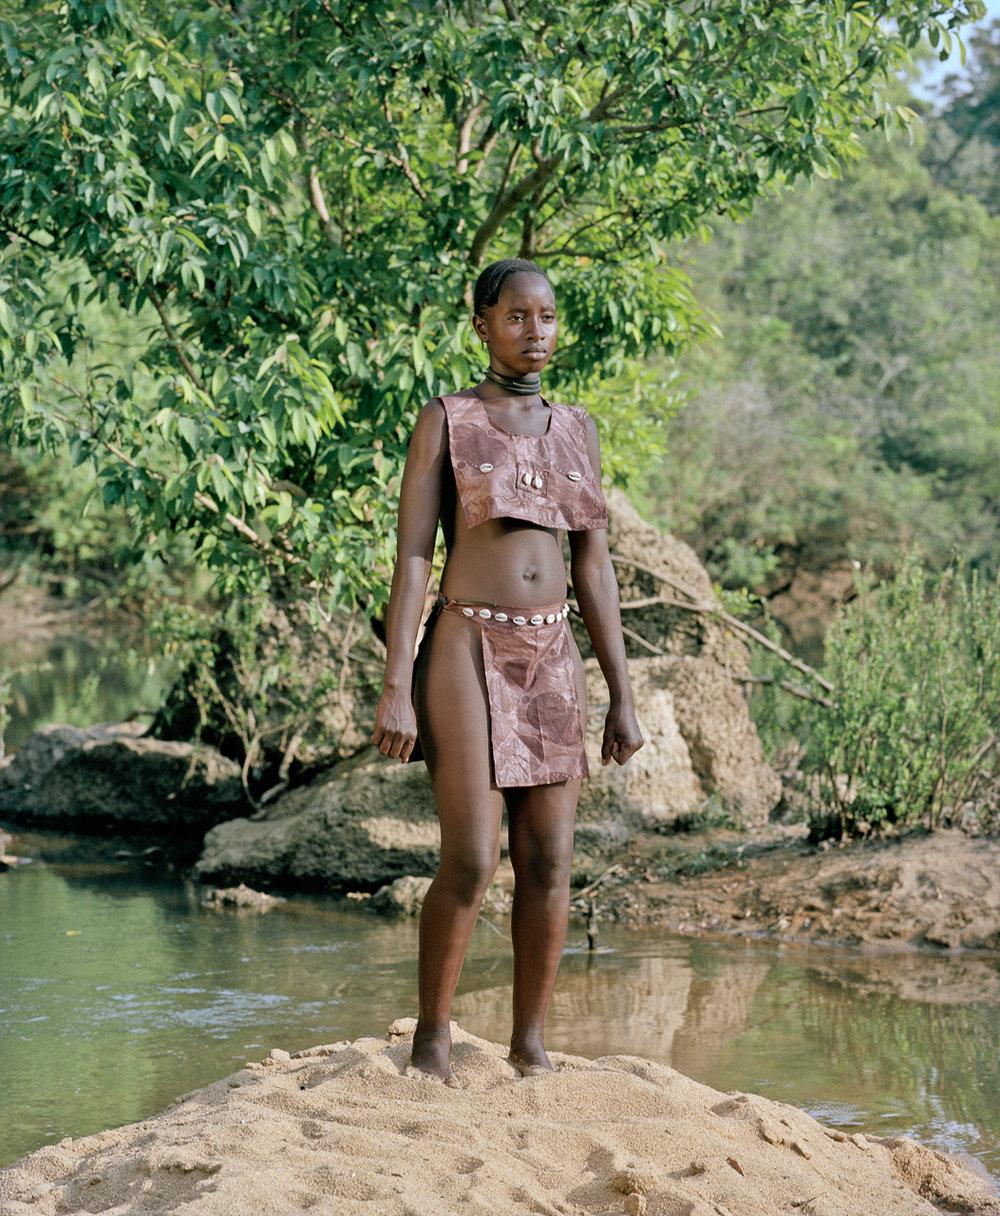 POPCAP_2012_Winner_1280px_RGB_1303_StatuetteZoo_Foret_Guinee_2011_Namsa_Leuba.jpg